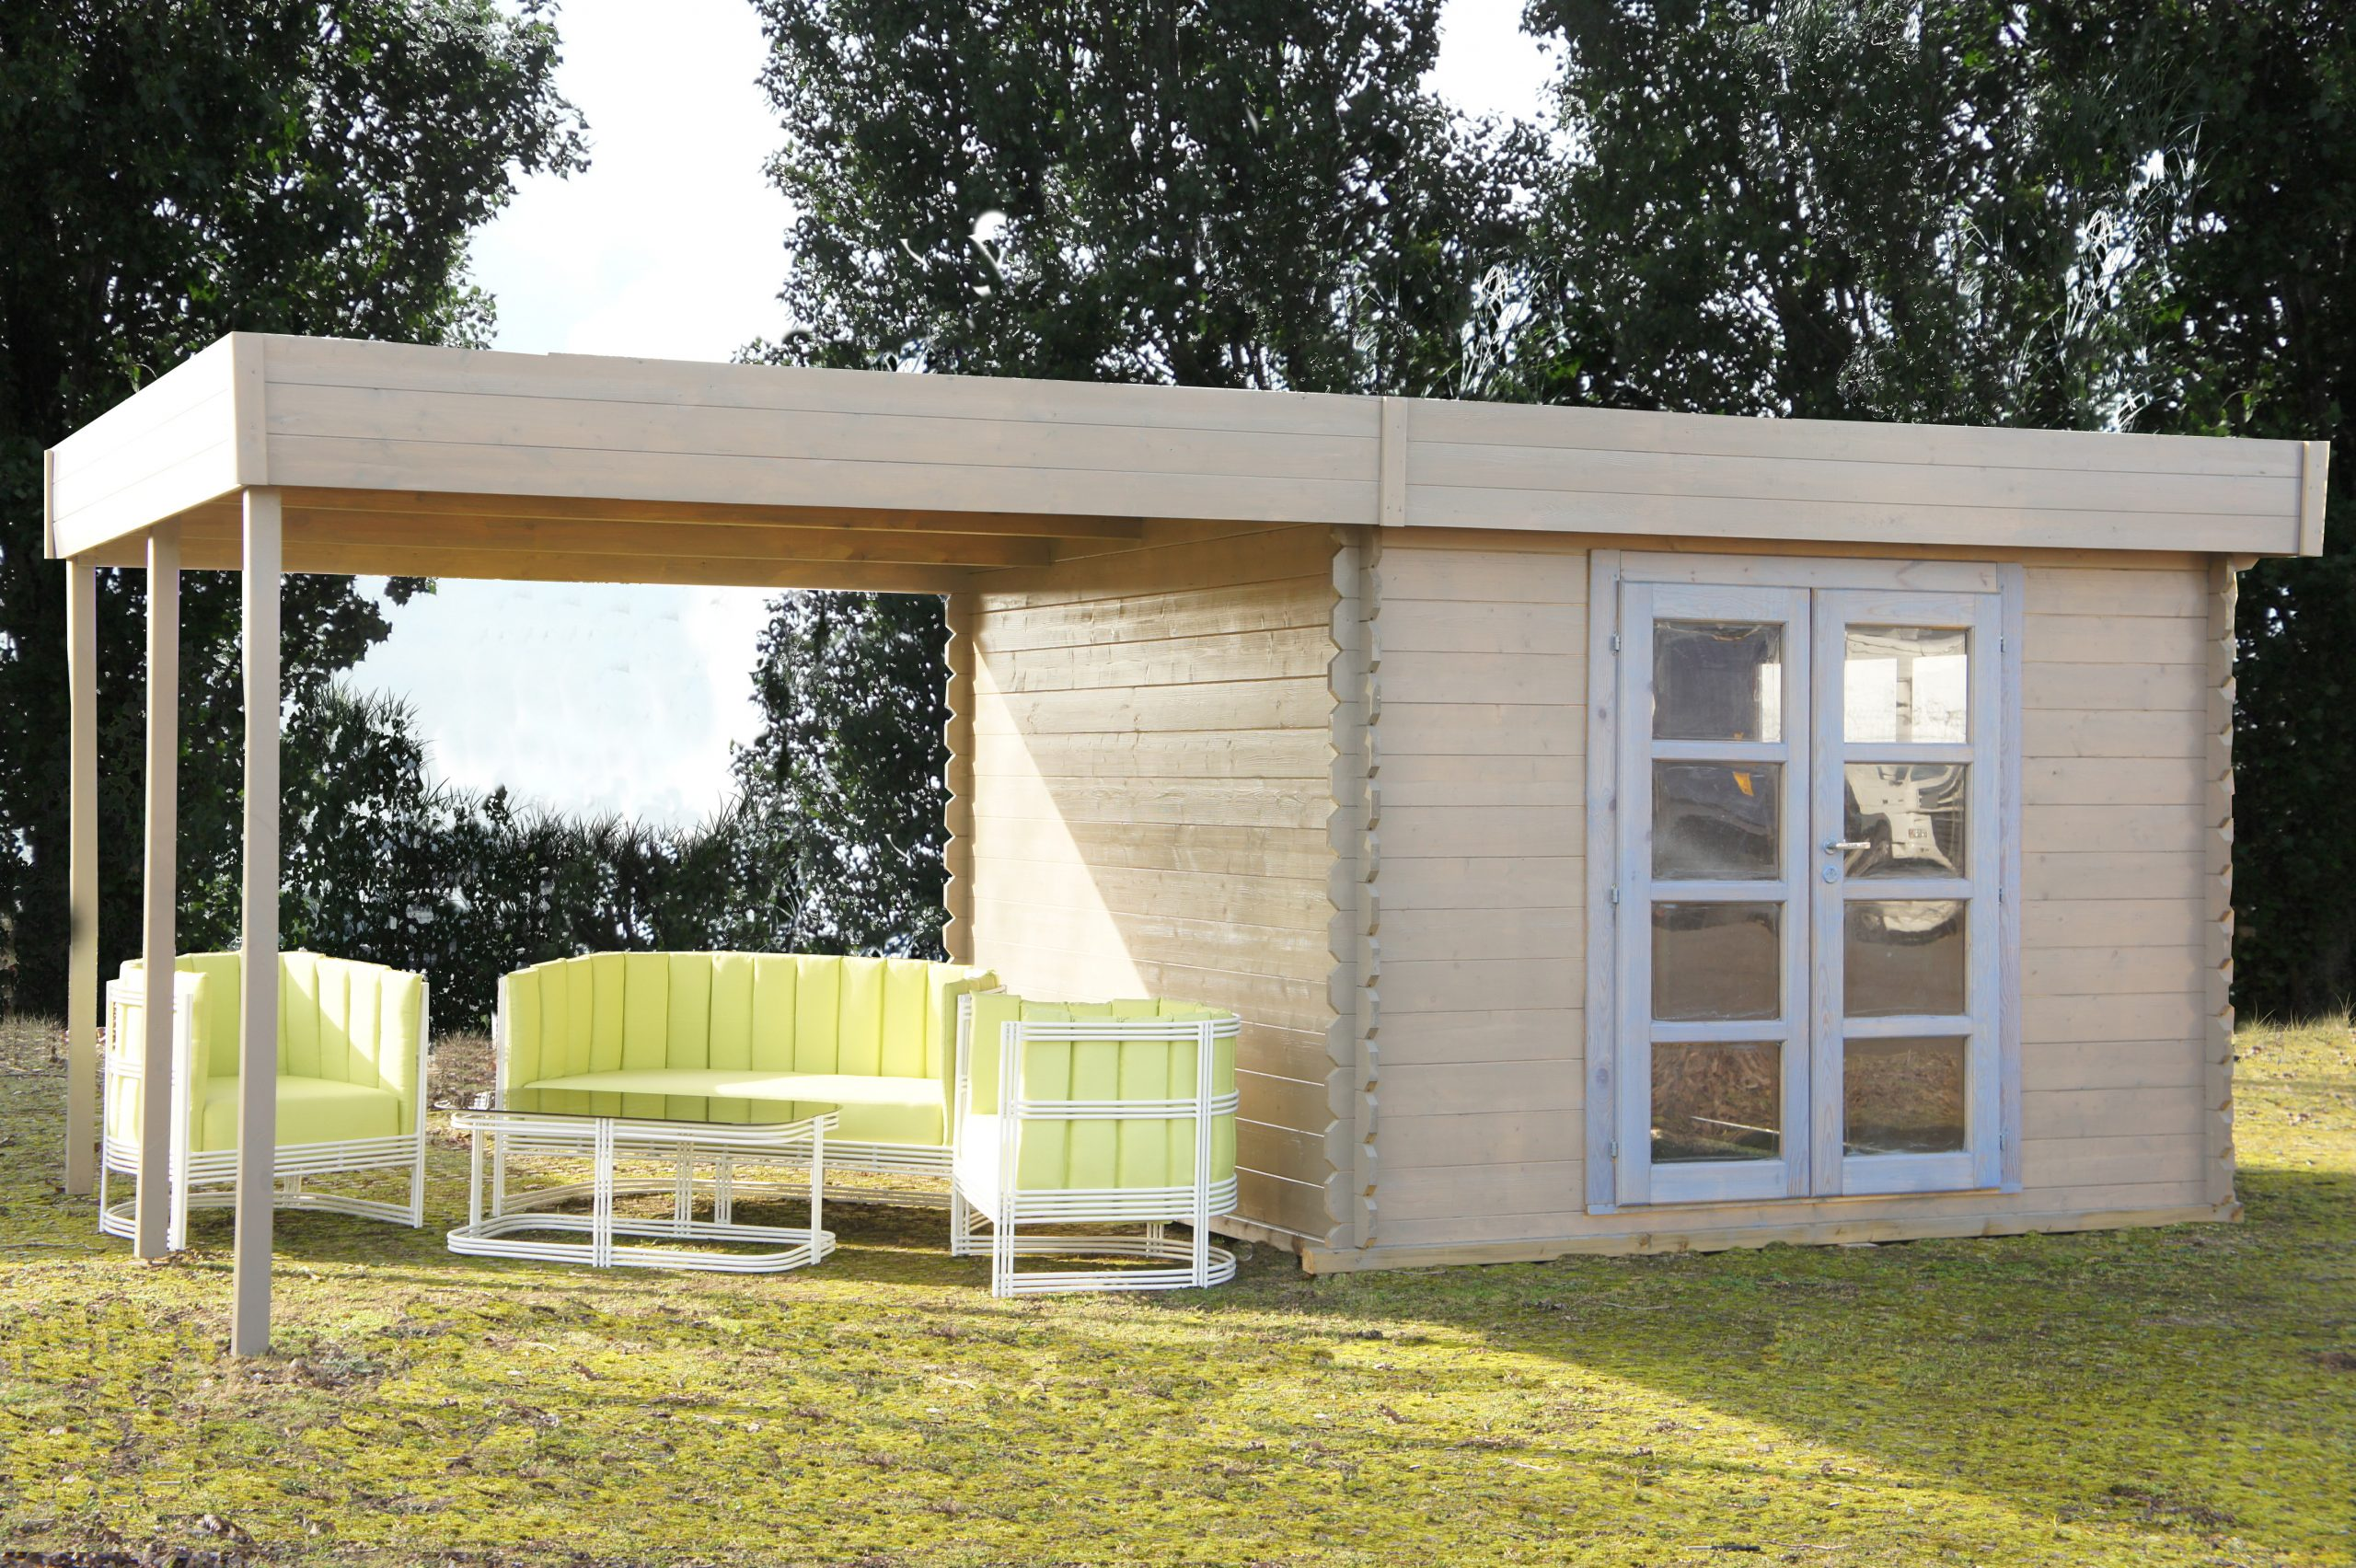 Cabane Jardin Toit Plat destiné Chalet De Jardin Leroy Merlin